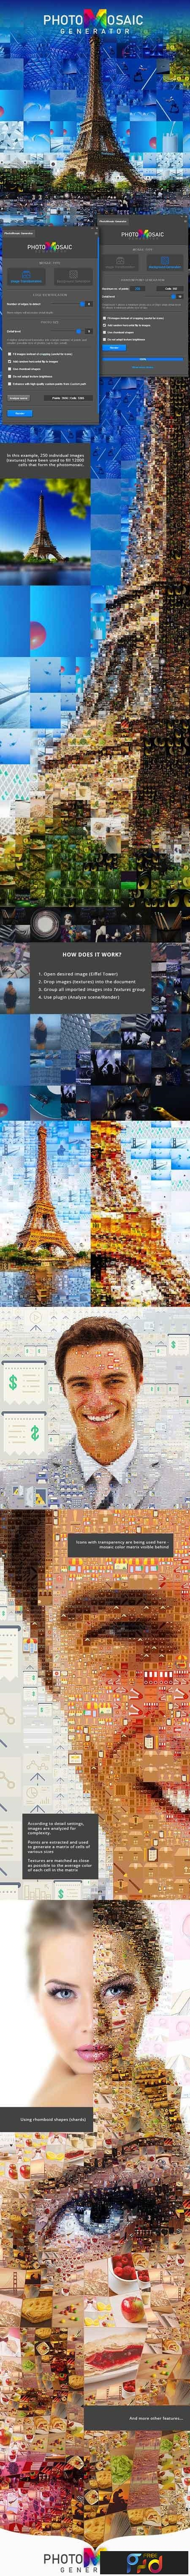 PhotoMosaic Generator - Photoshop Extension 23019920 - FreePSDvn